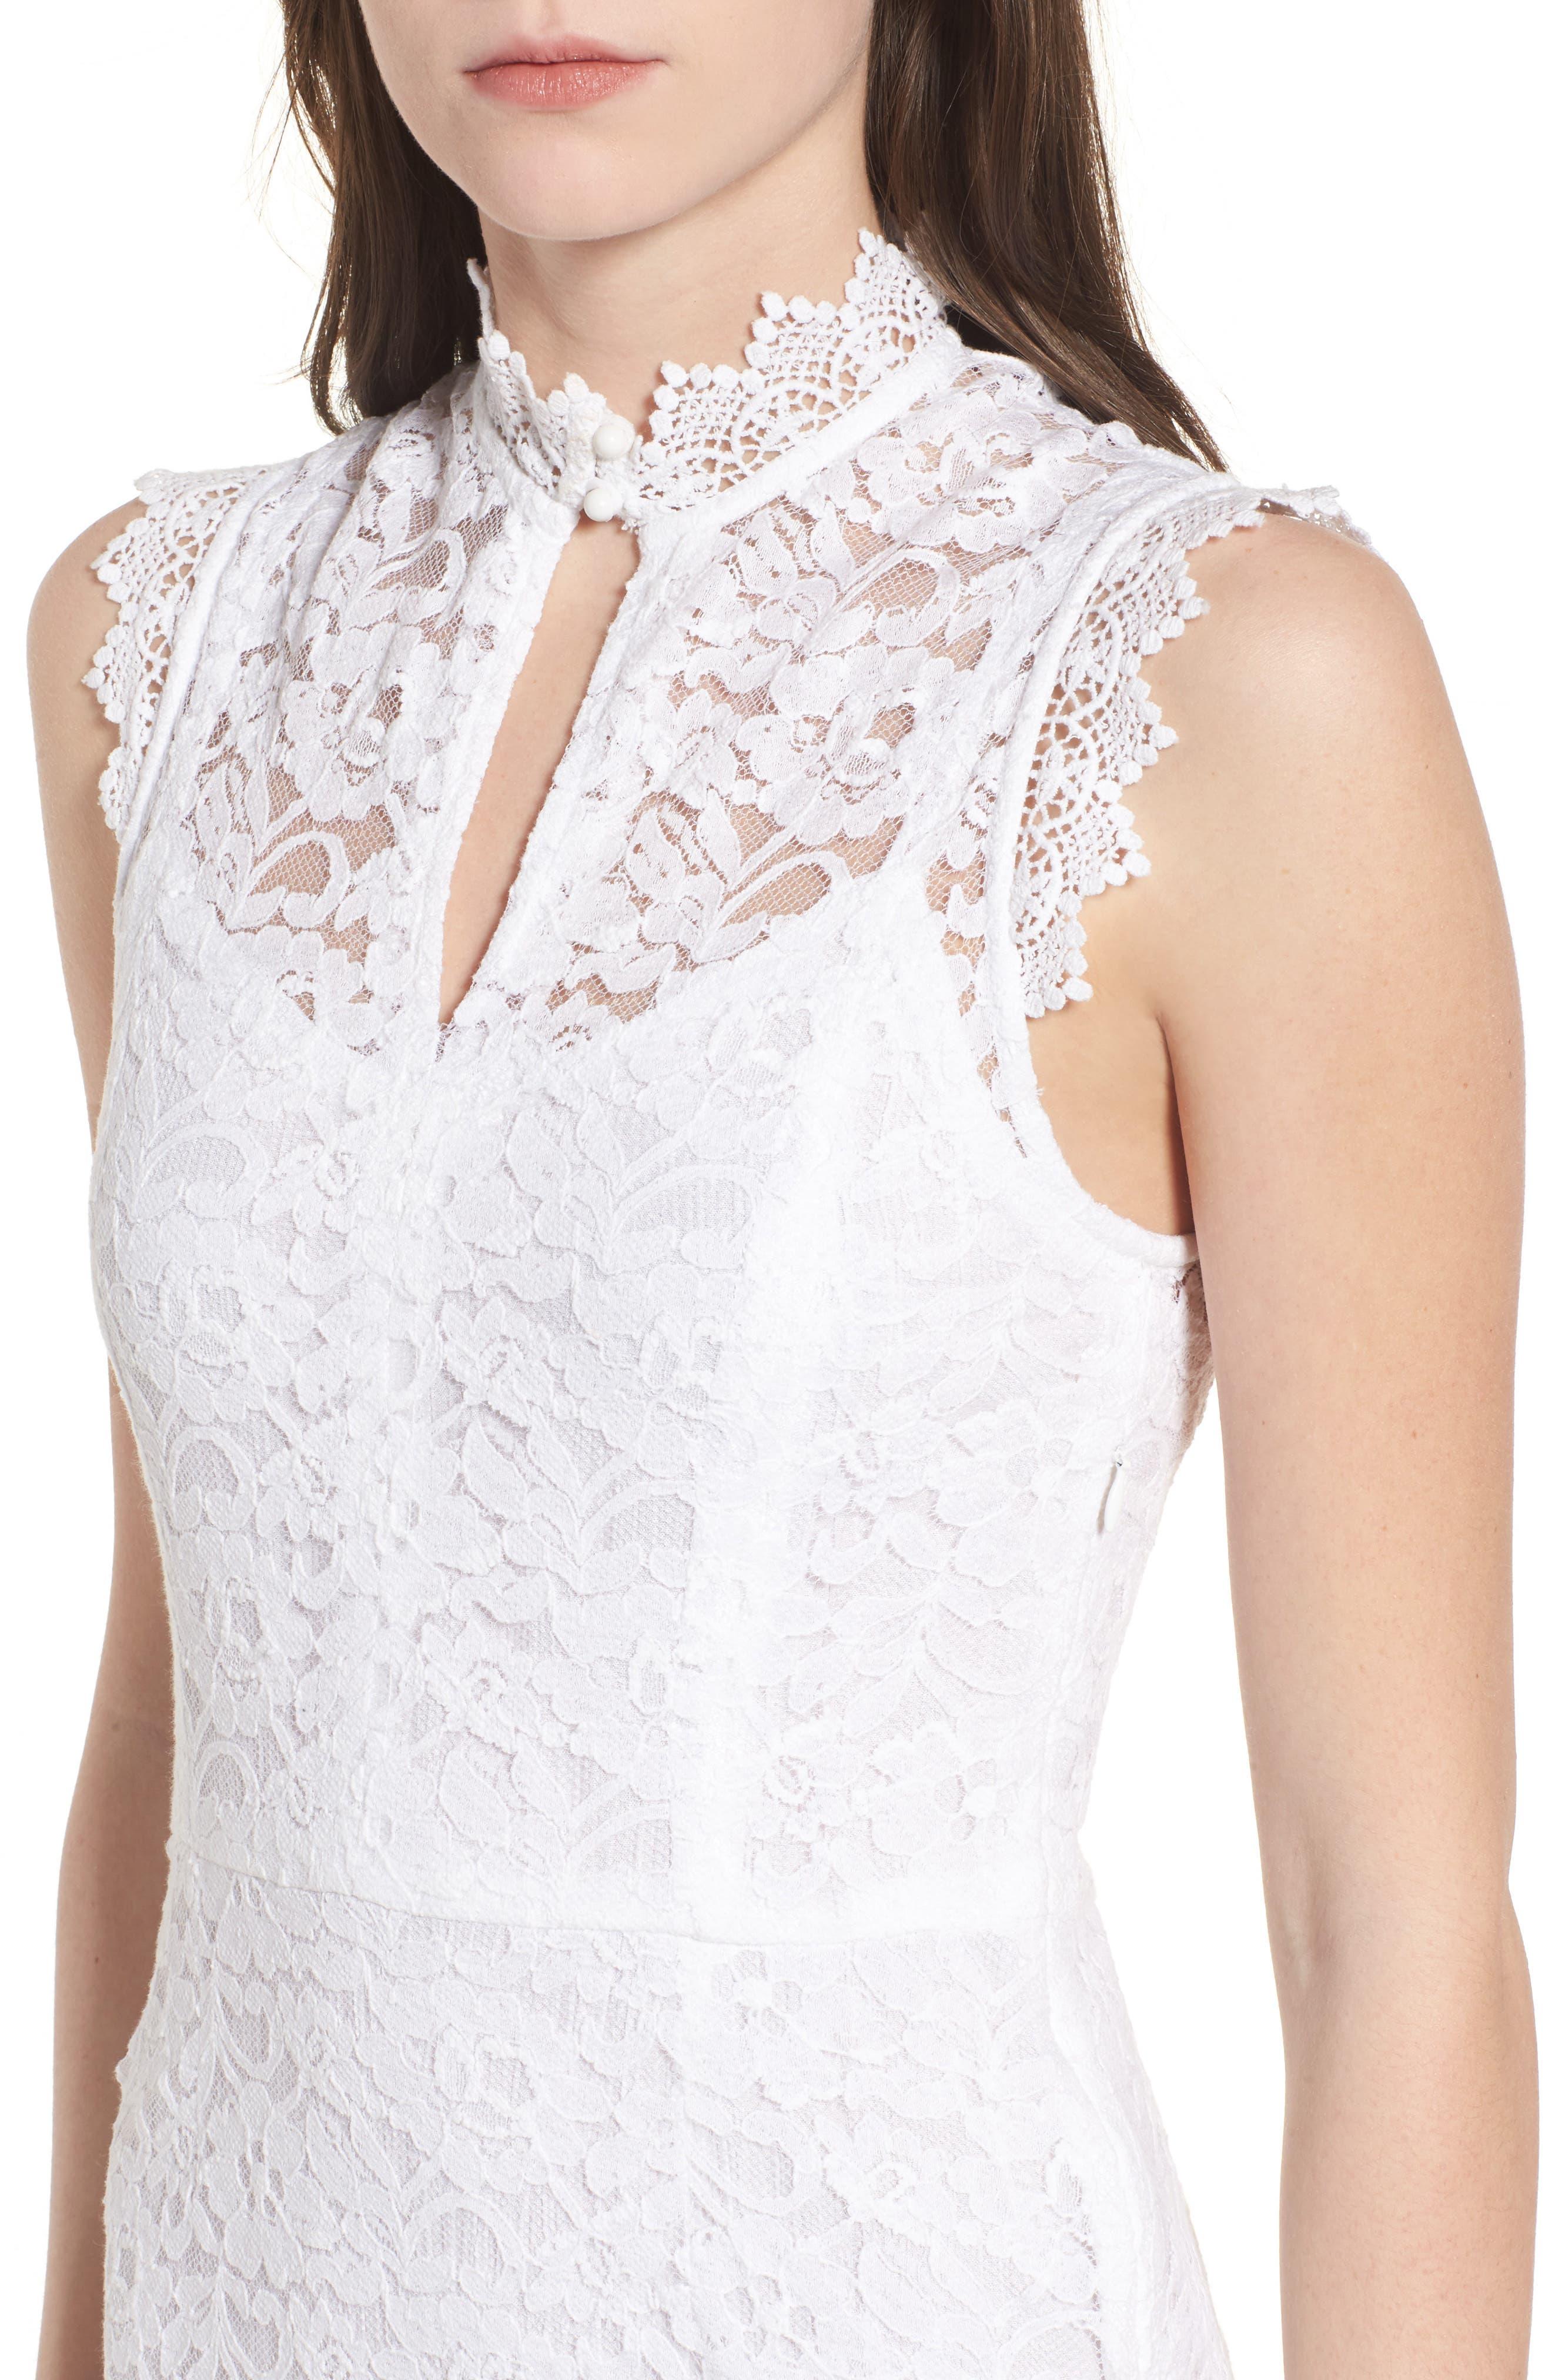 Rapture Lace Keyhole Dress,                             Alternate thumbnail 4, color,                             White